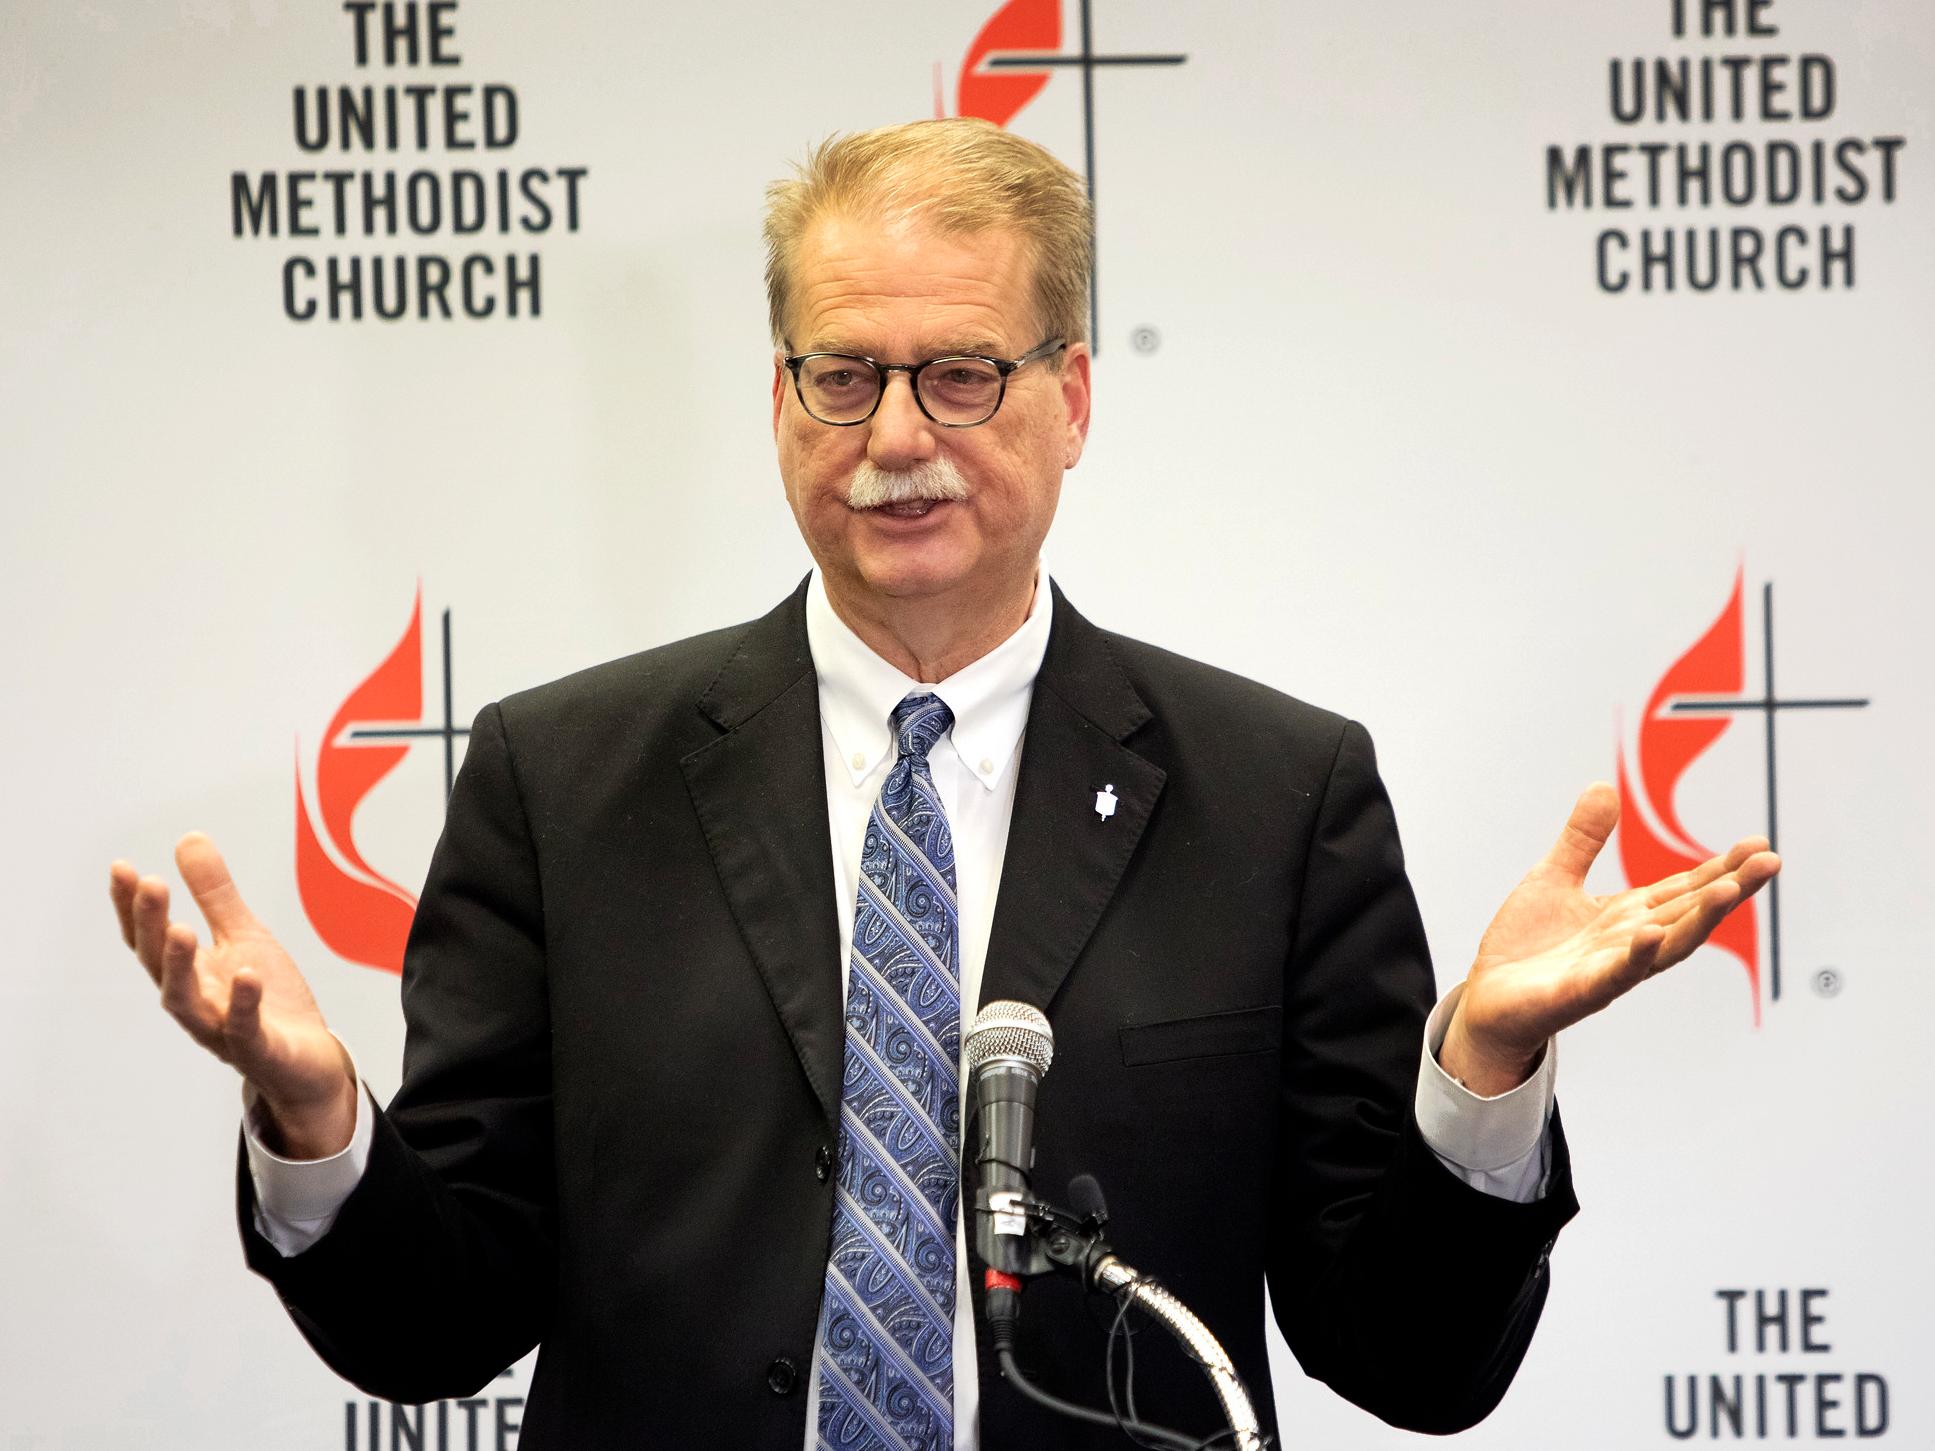 Bishop Kenneth Carter speaks at a press conference. Photo by Kathleen Barry, UMNews.